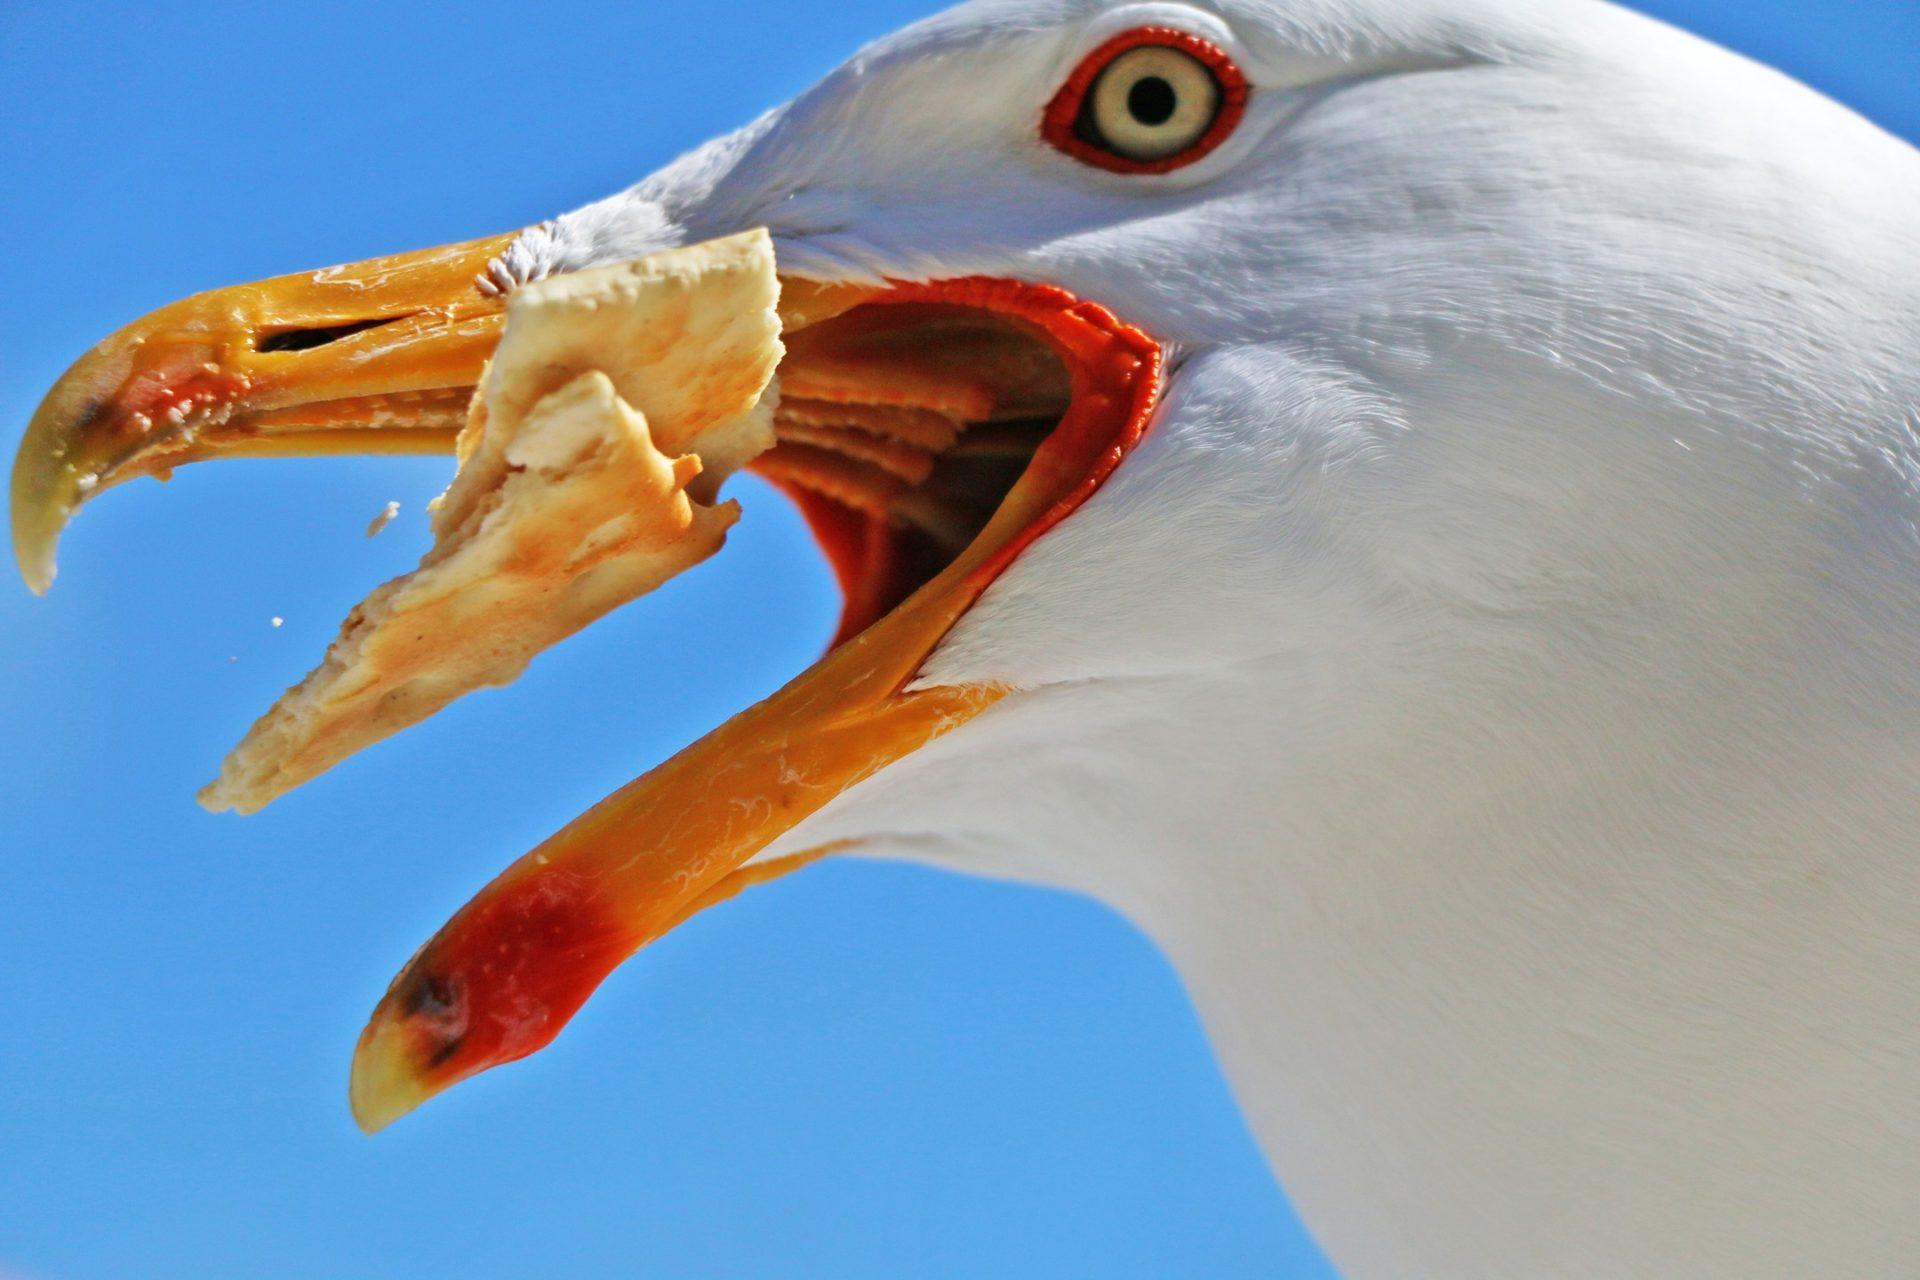 Seagull friendly